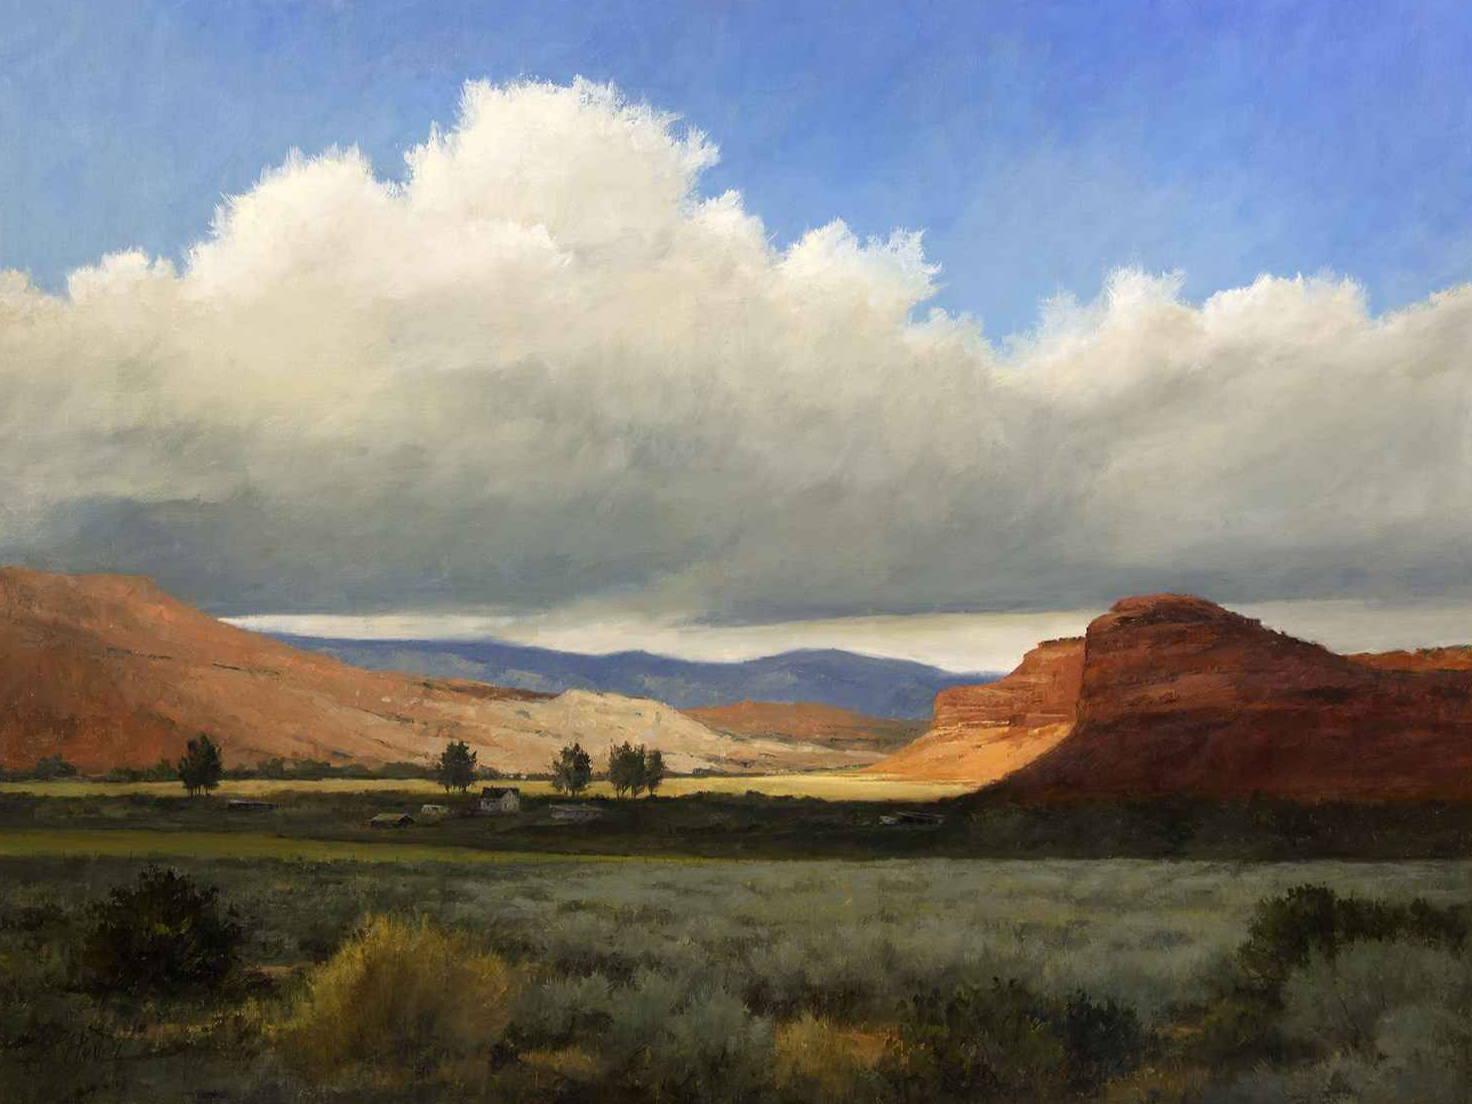 Peggy Immel. Plein Air Art. Landscape Art. Sorrel Sky Gallery. Santa Fe Art Gallery. Maura Allen. Edward Aldrich. Kevin Red Star. Ray Hare. Durango Art Gallery.